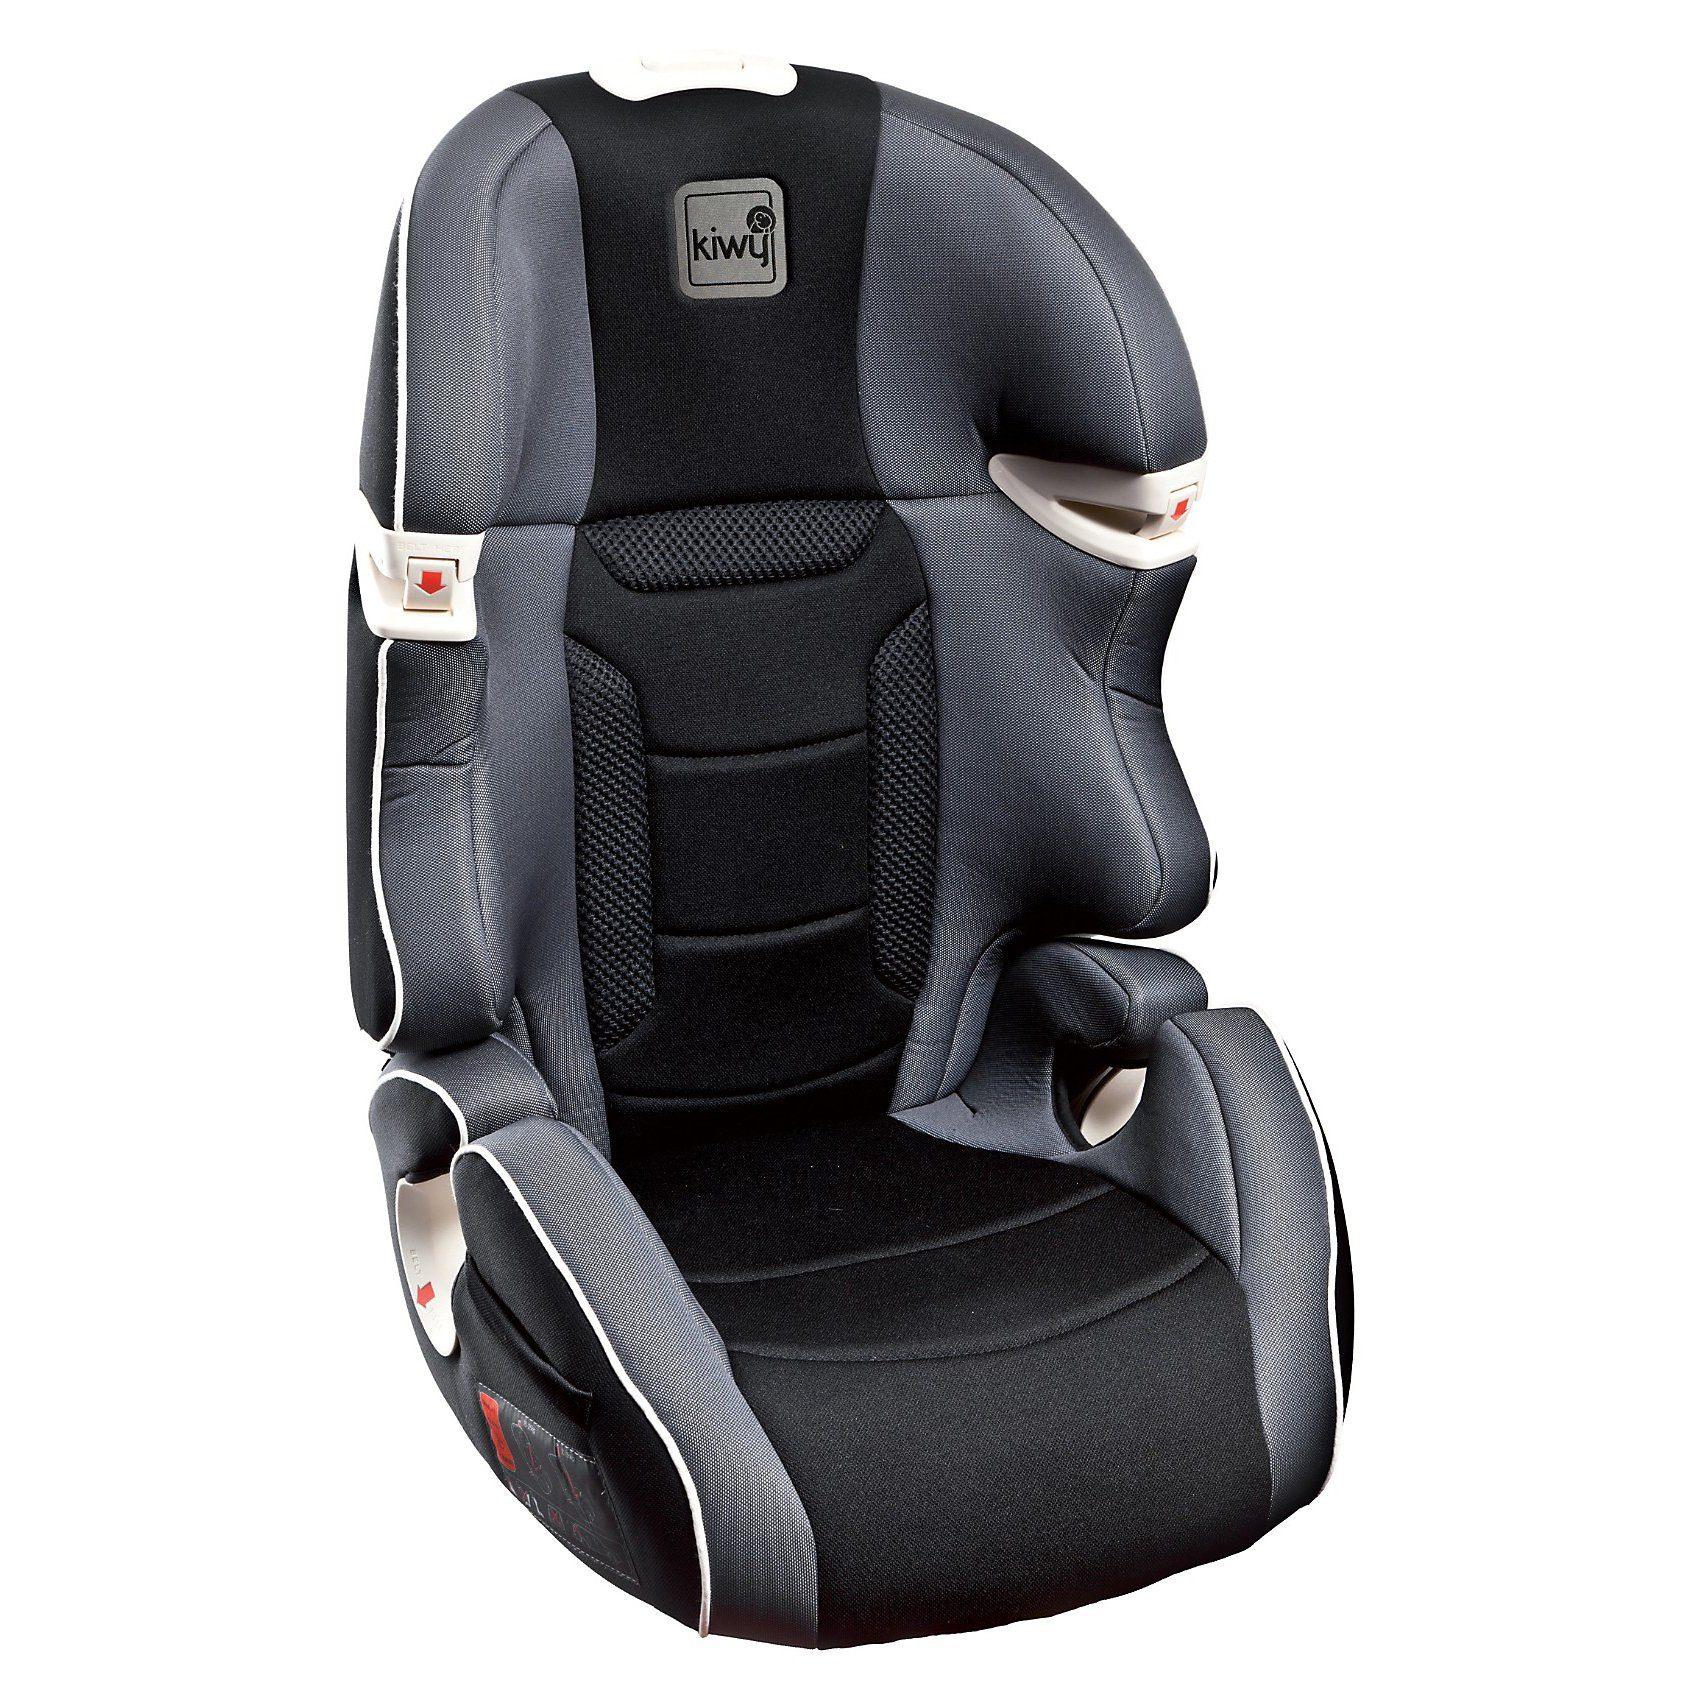 Kiwy Auto-Kindersitz S23, carbon, 2016